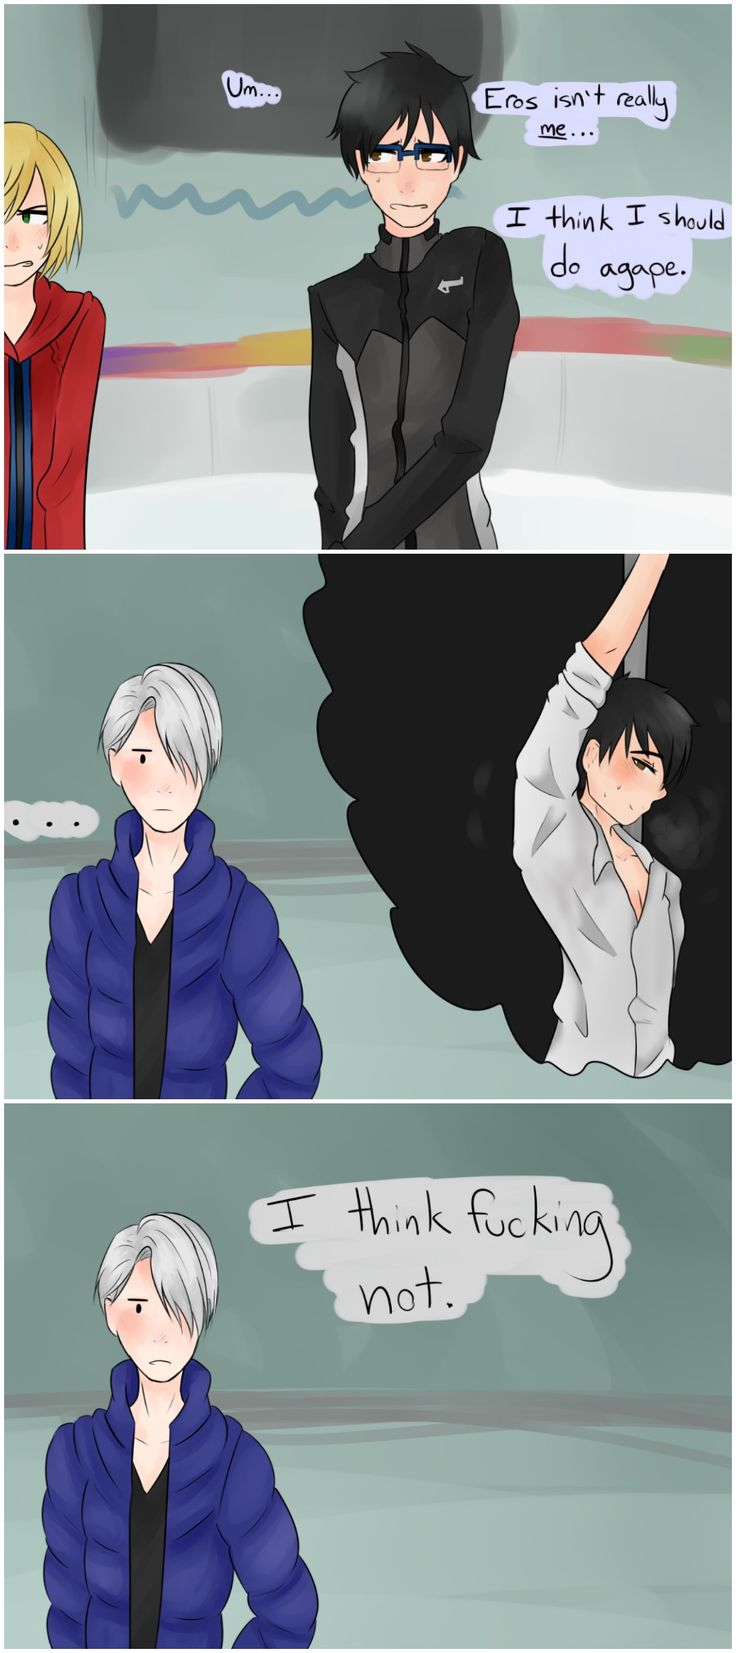 Lol, acadentaly posted this to Hetalia, Yuri on ice